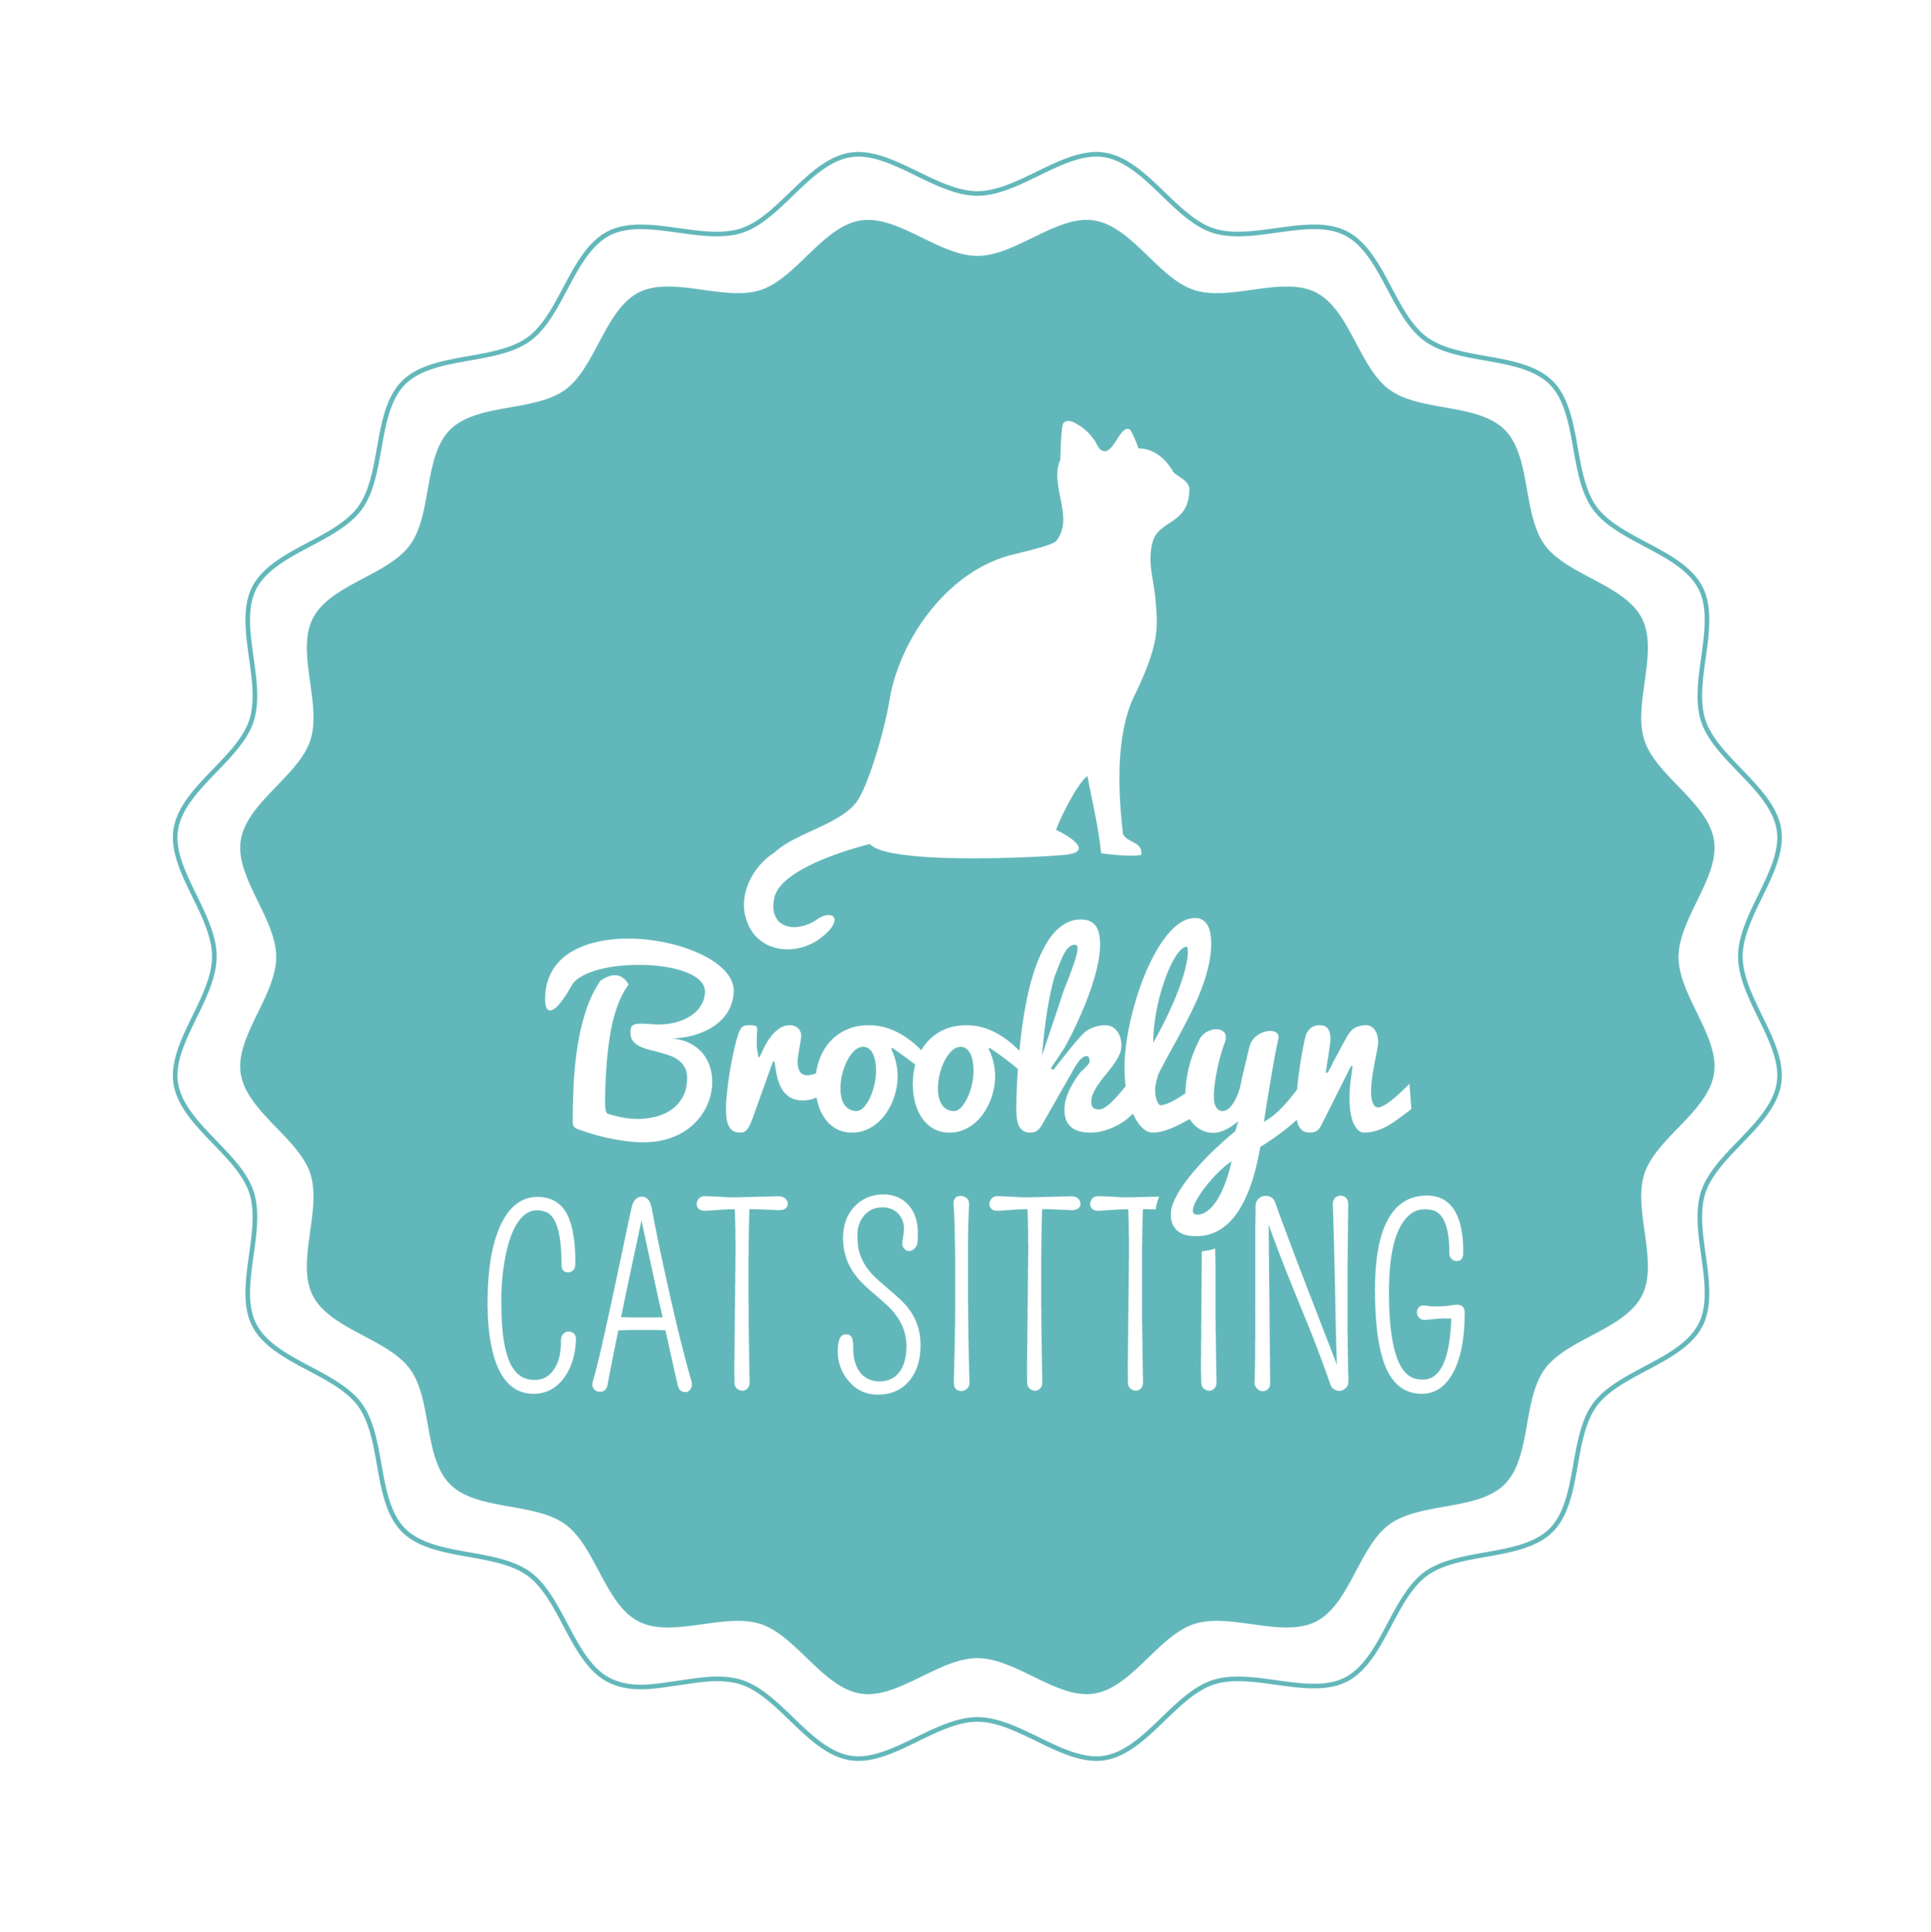 kim-gee-studio-graphic-design-brooklyn-cat-sitting-logo